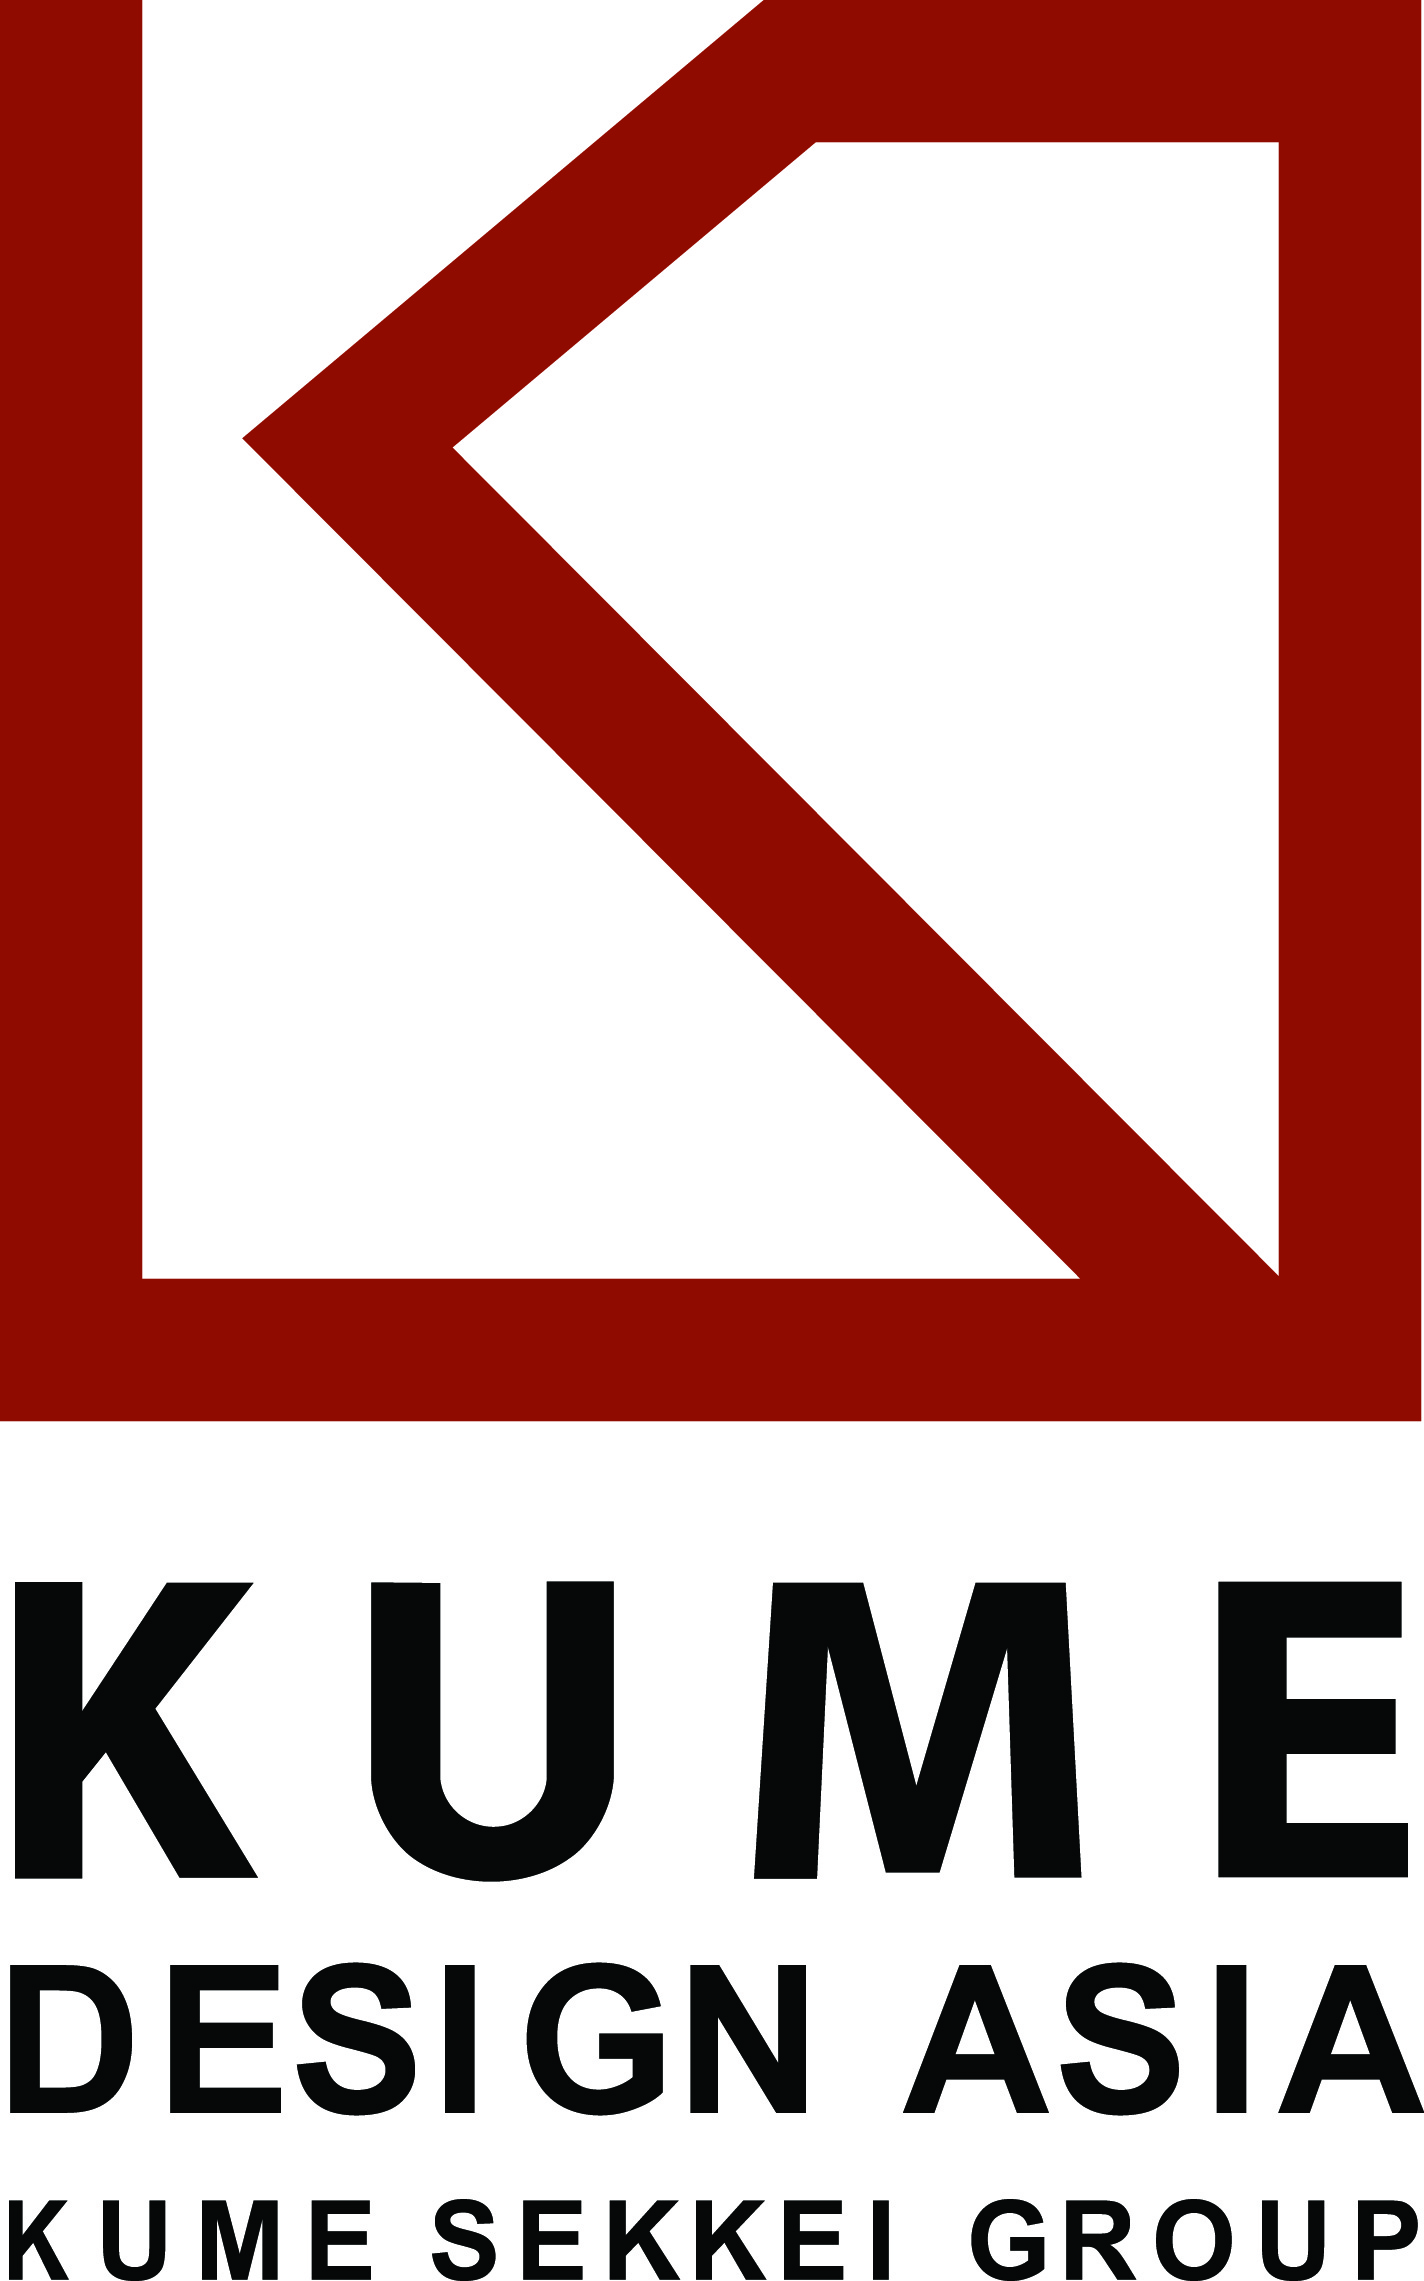 Kume Design Asia Co., Ltd - KDA